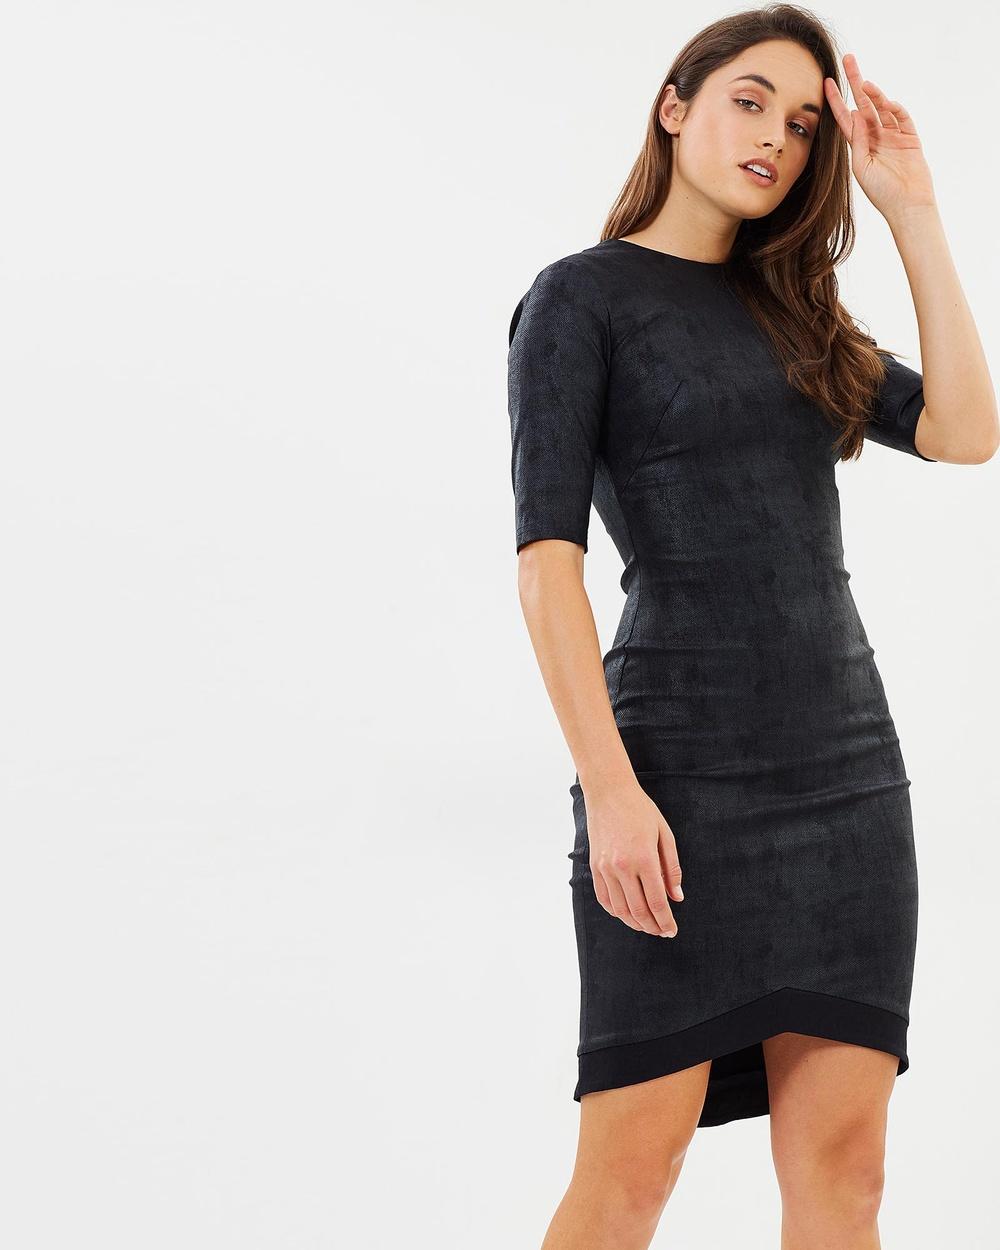 LJ CHAPLIN Valentina Dress Dresses Black Valentina Dress